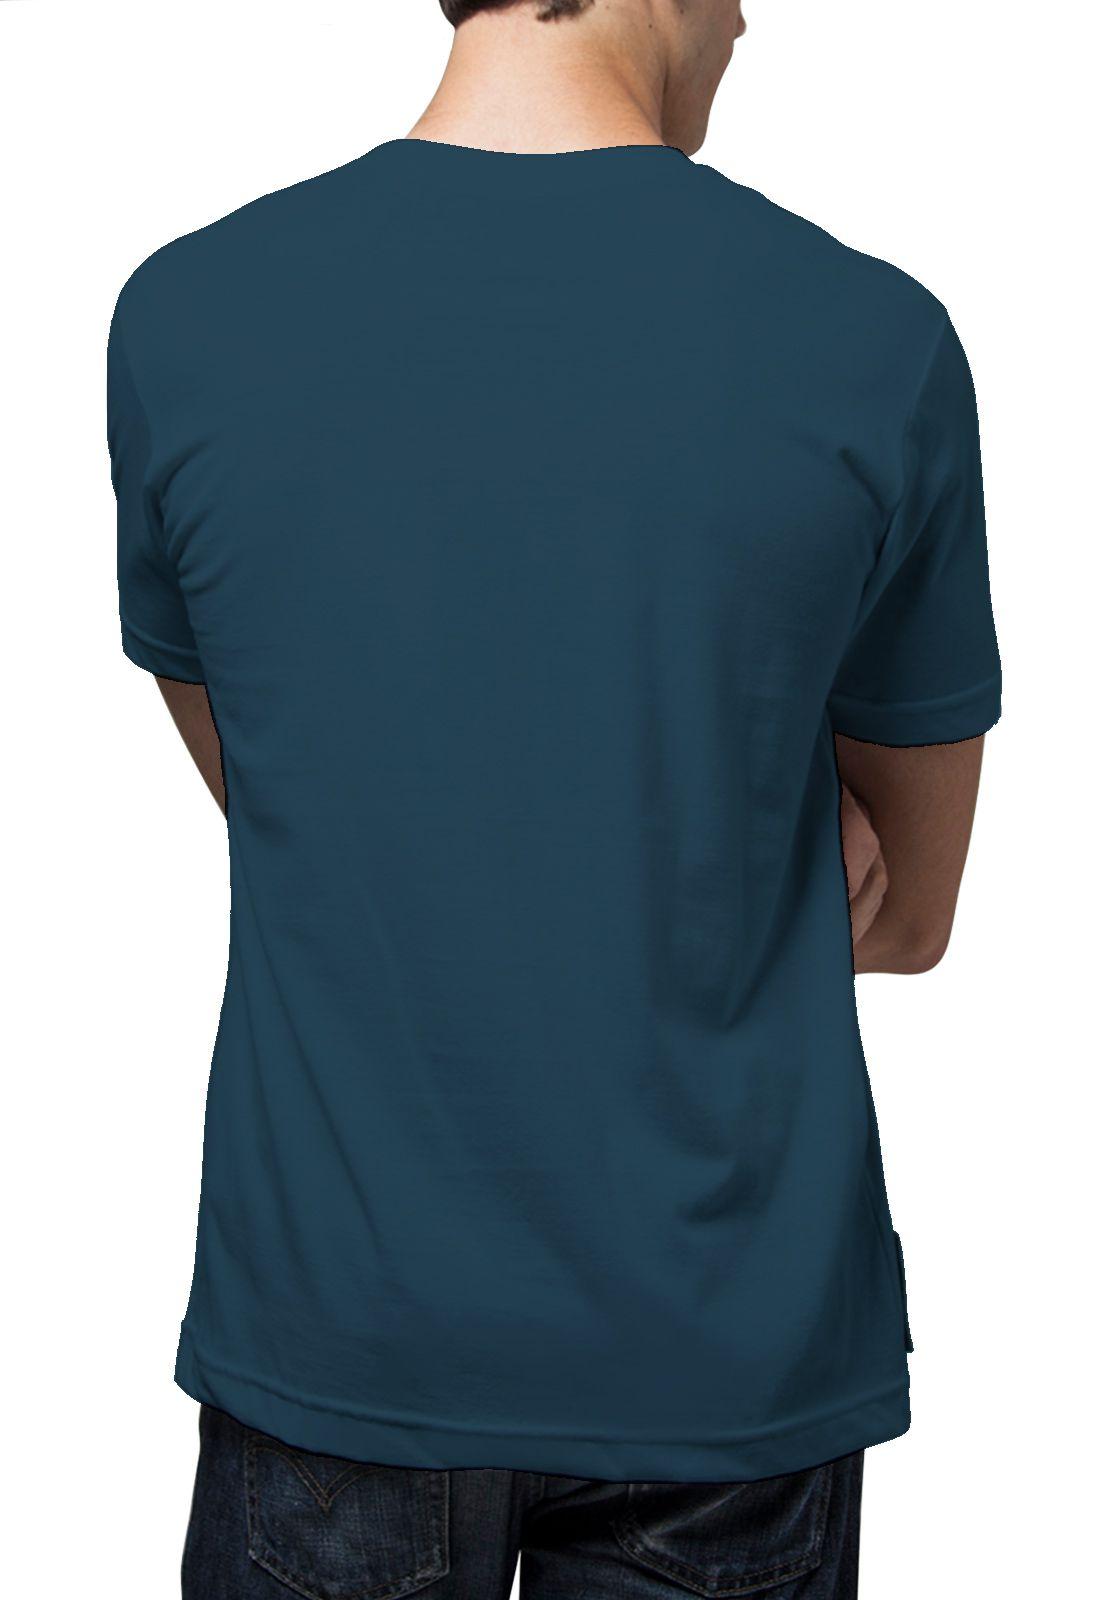 Camiseta Amazônia Básica Árvore Bordada - Azul Escuro